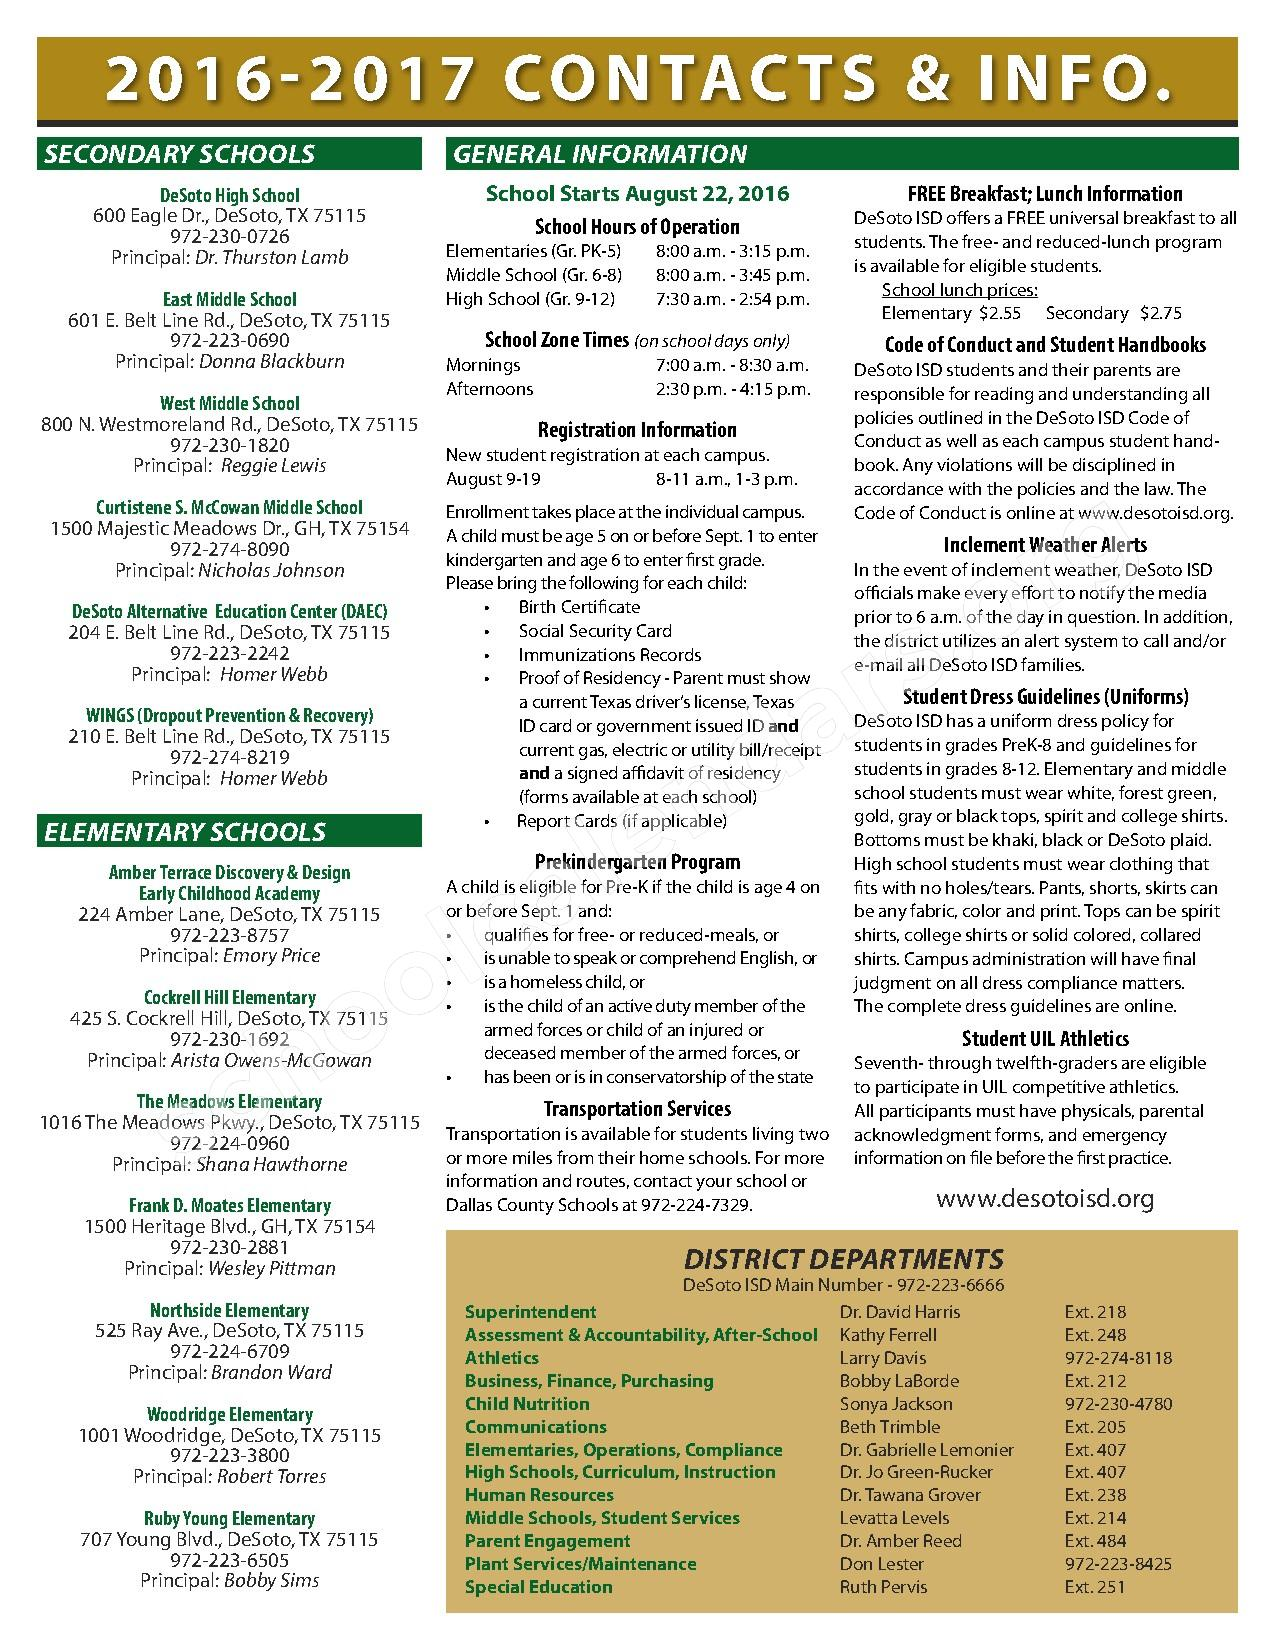 2016 - 2017 School Calendar – Desoto Independent School District – page 2